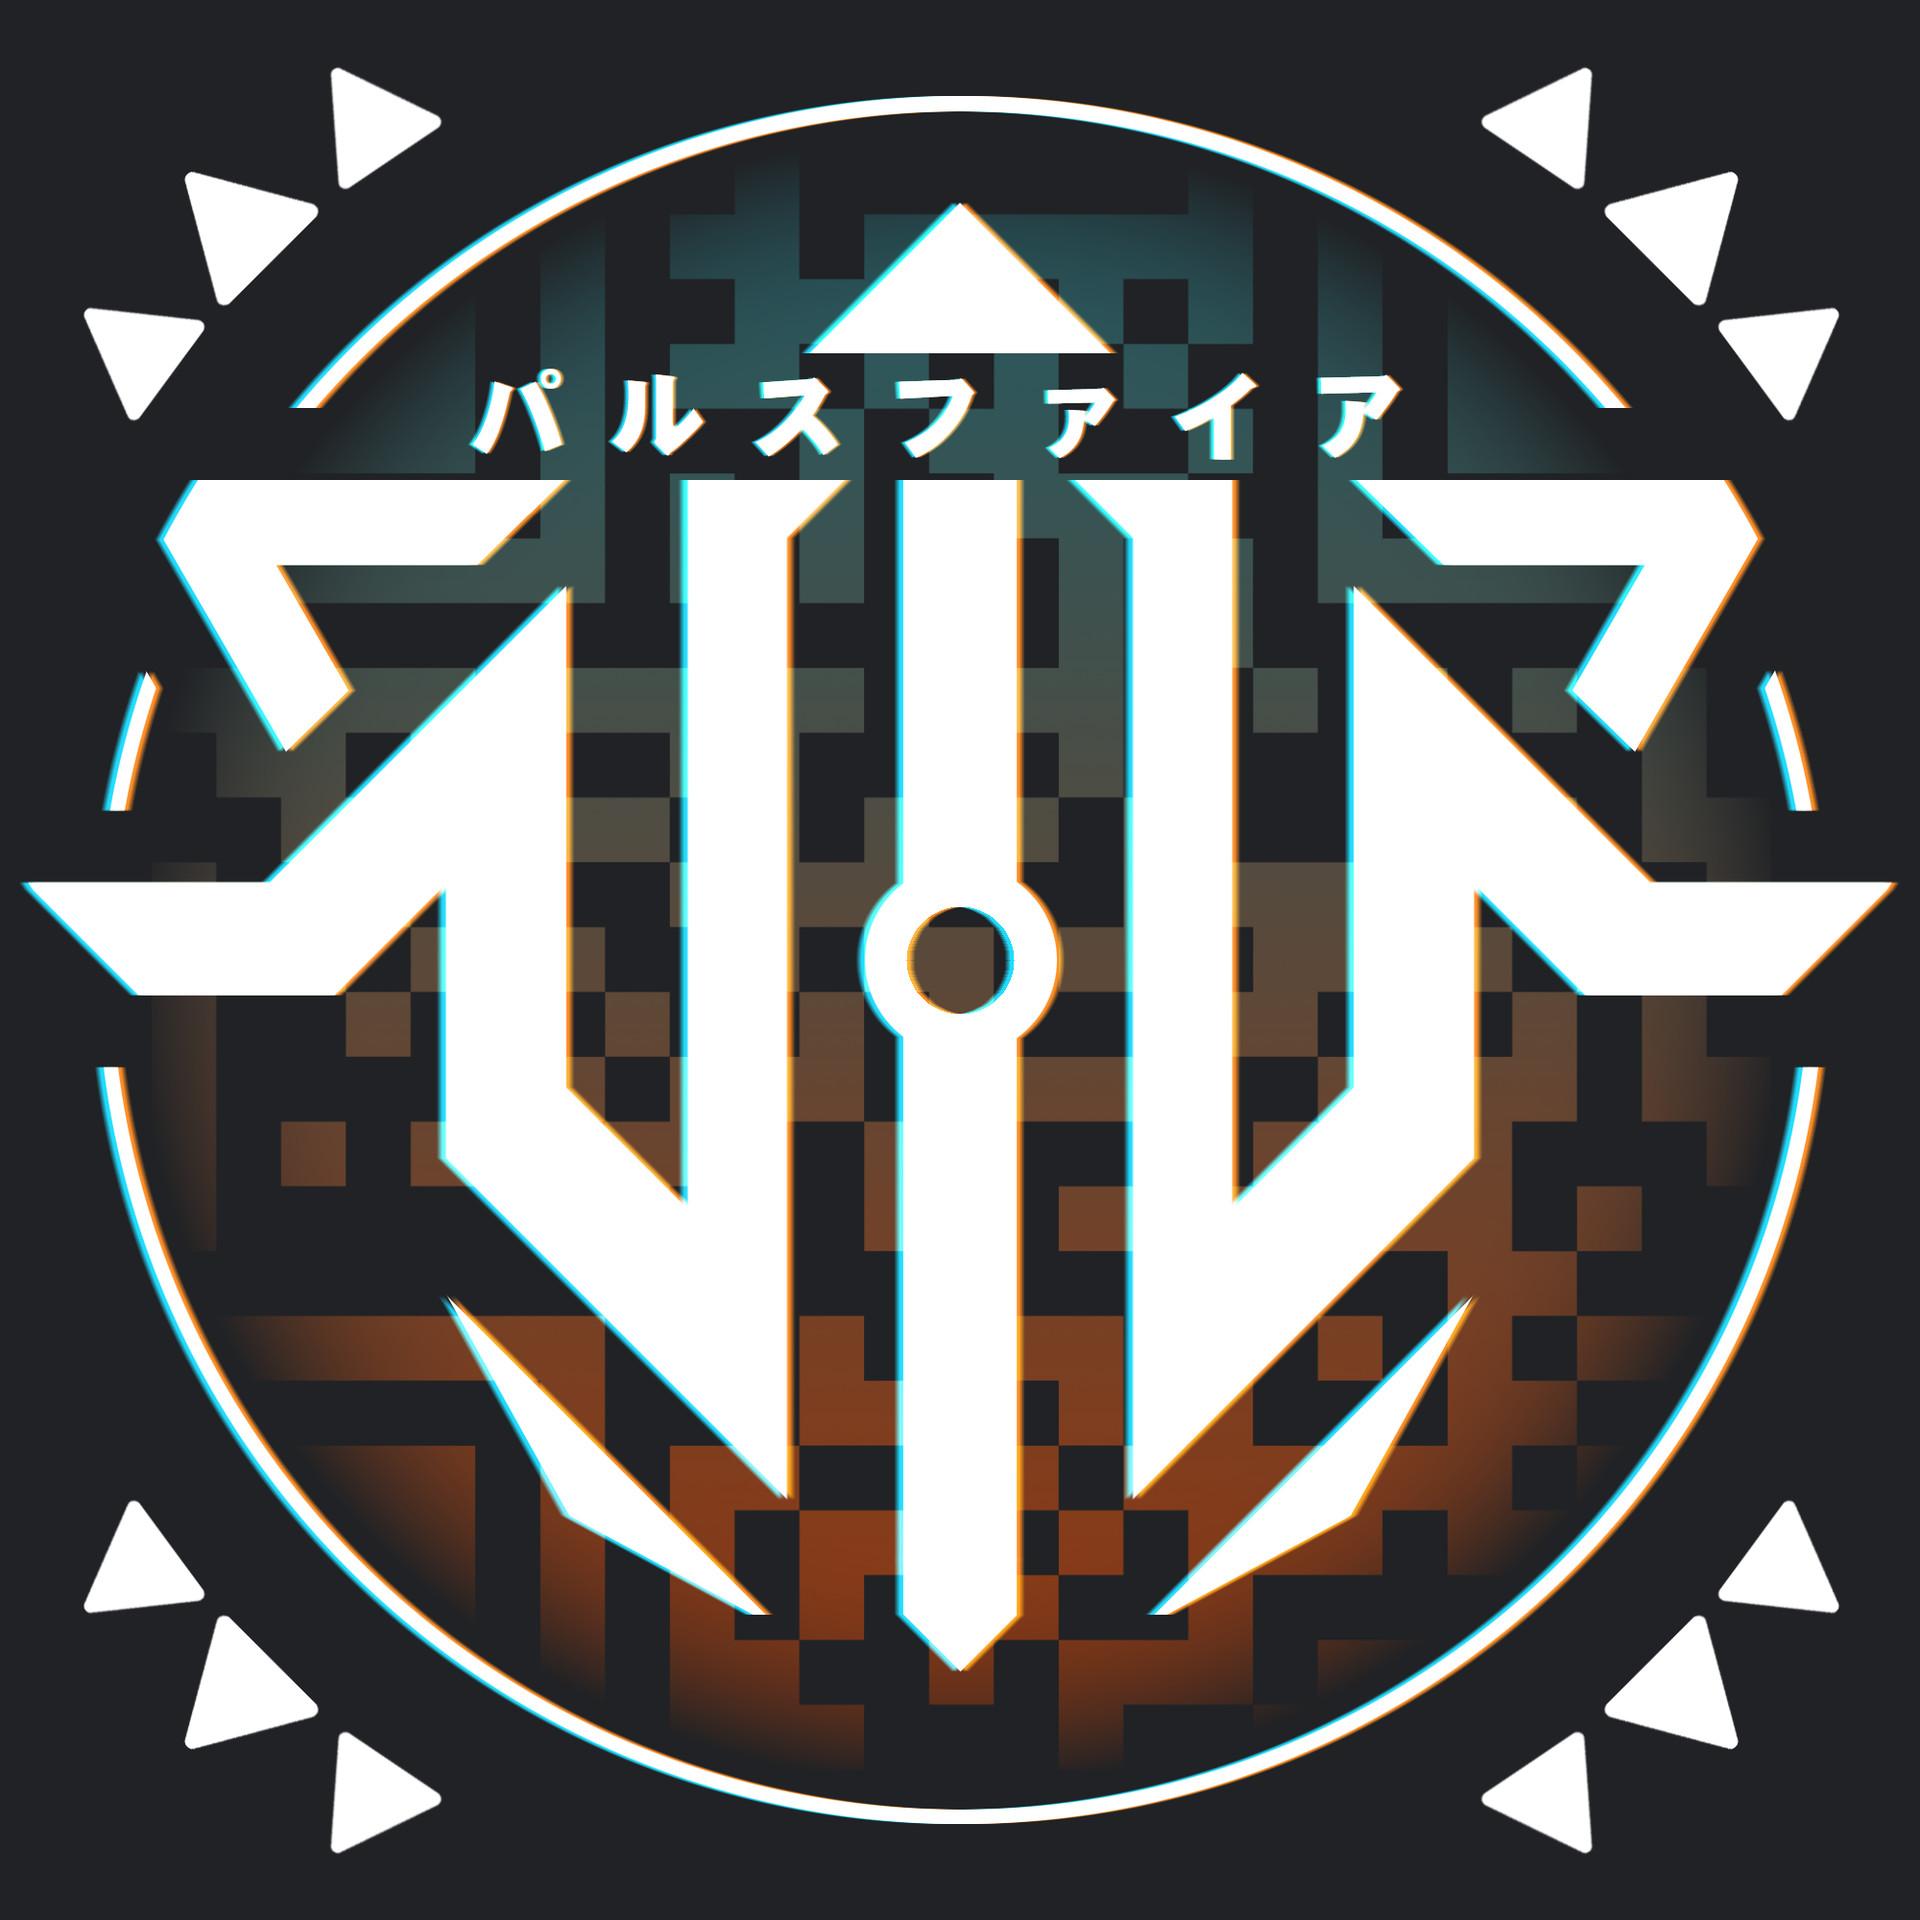 ArtStation - Discord Server Logo 2, CHRISPY NI